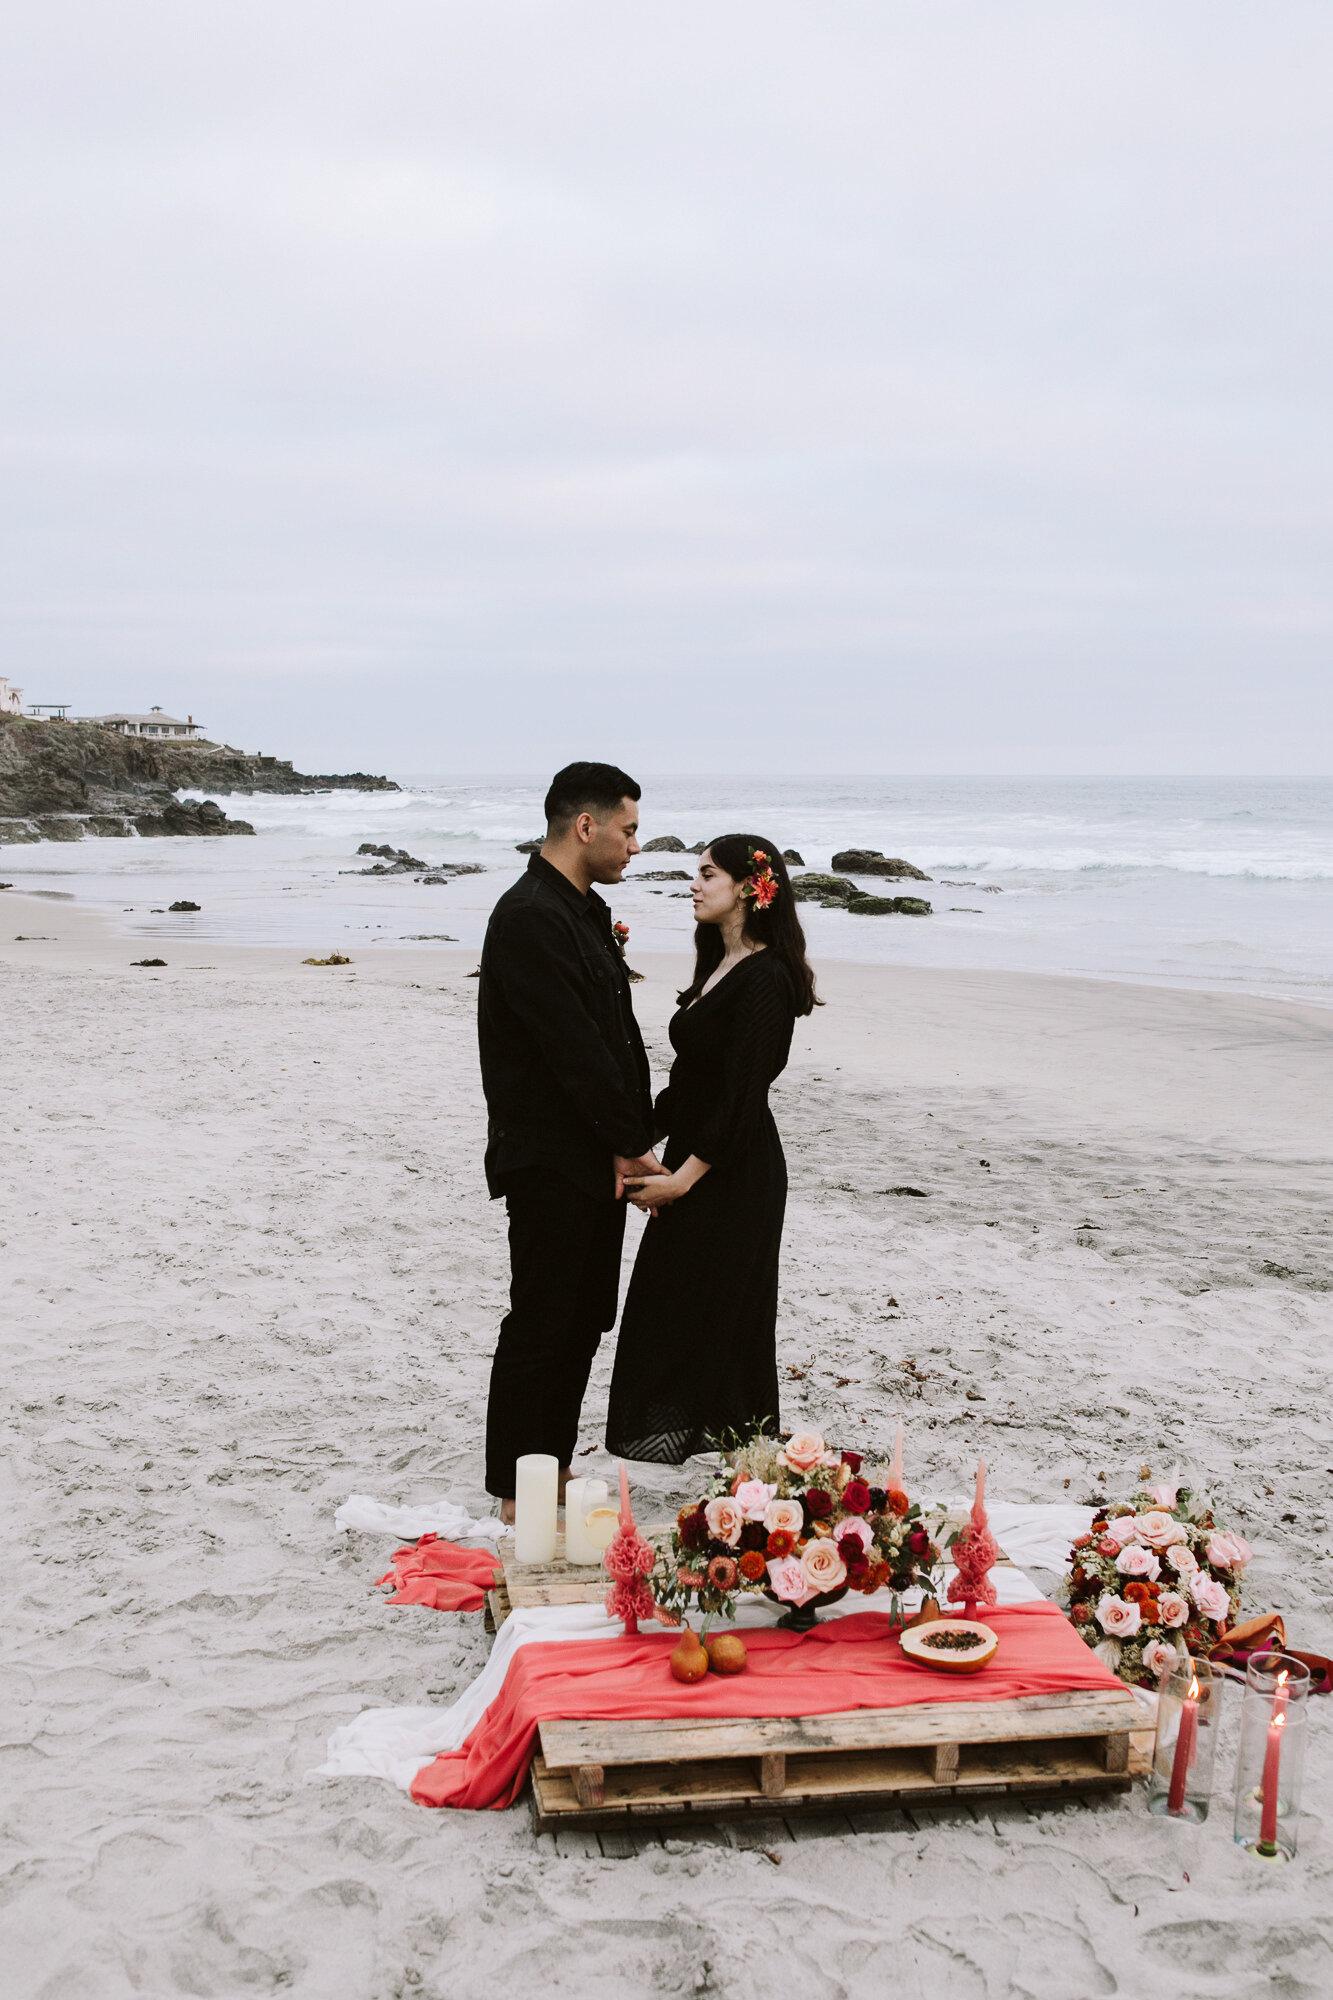 San_diego_wedding_photogapher_alfonso_flores-16.jpg